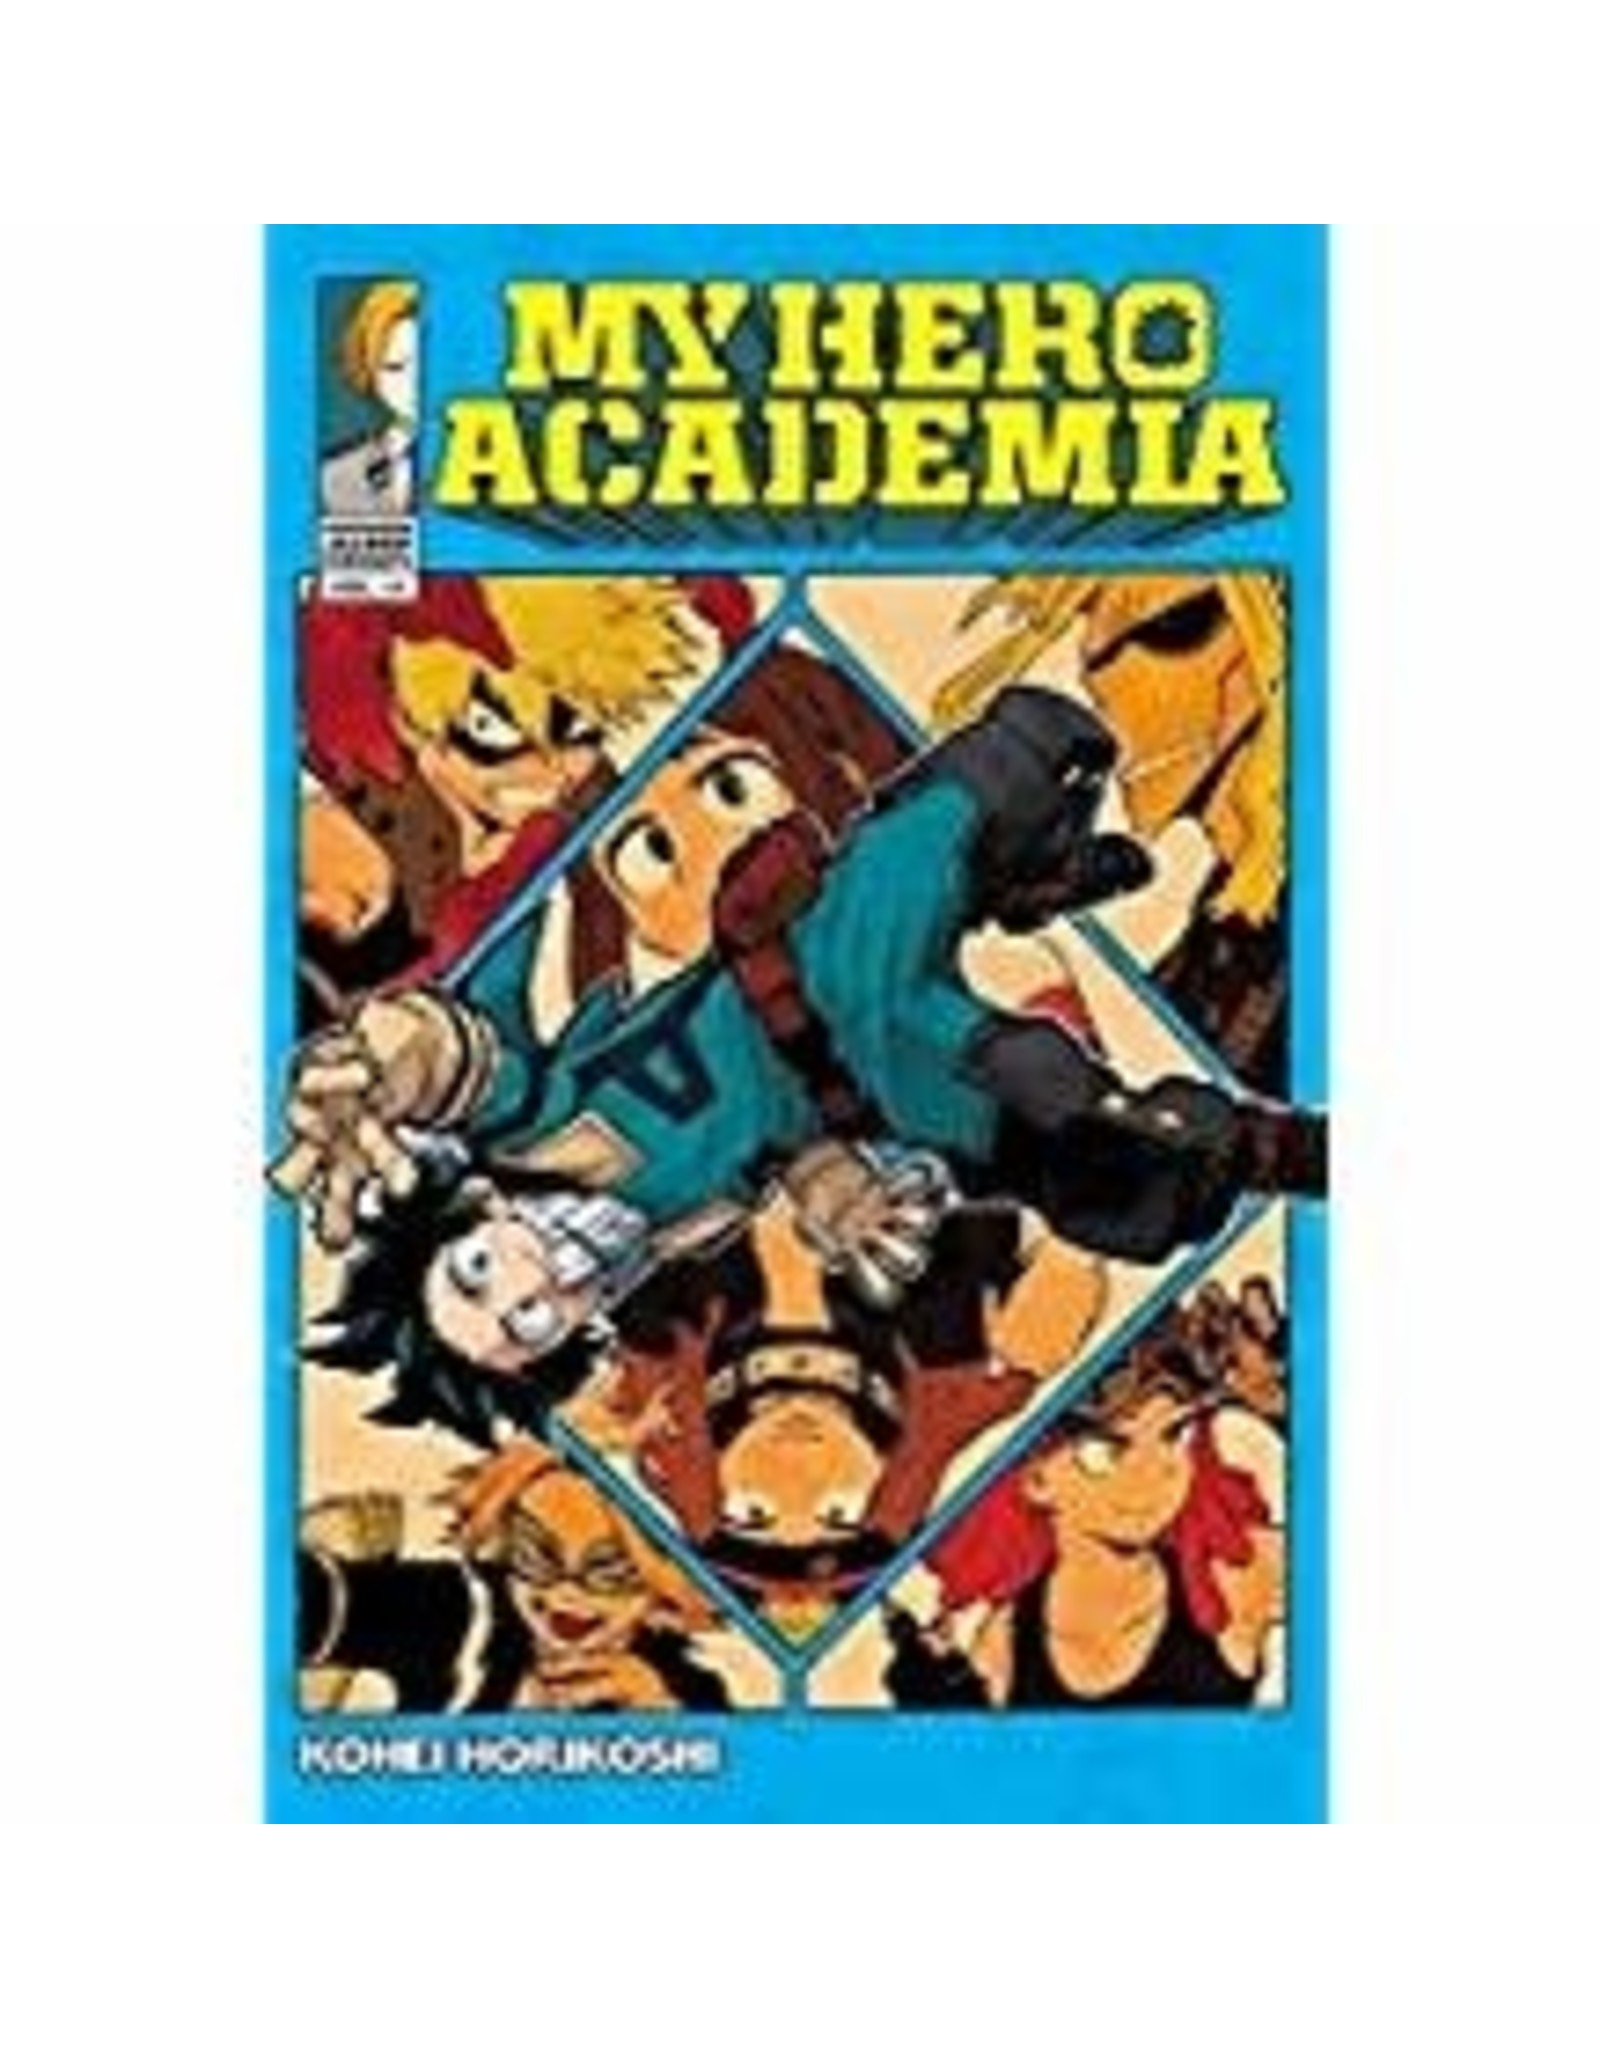 My Hero Academia Volume 12 (Engelstalig) - Manga